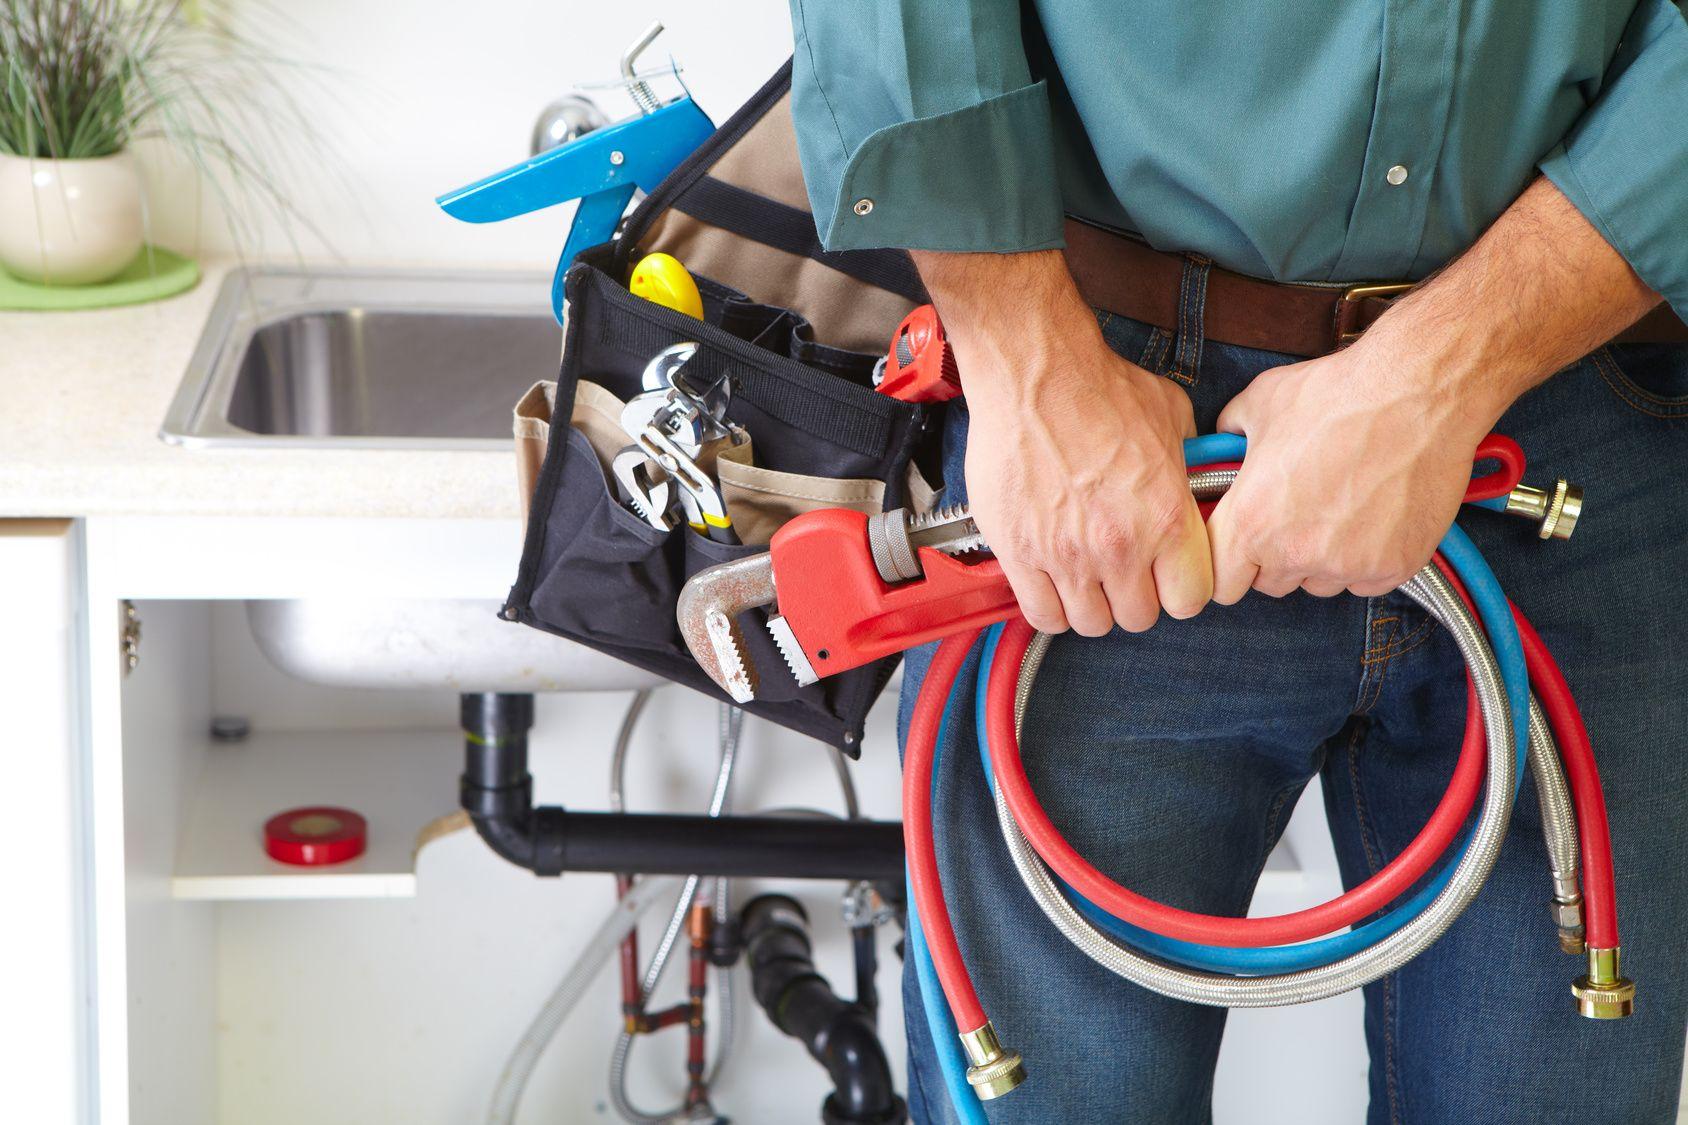 Best One Of Plumbing Services Plumbing Emergency Residential Plumbing Plumbing Problems